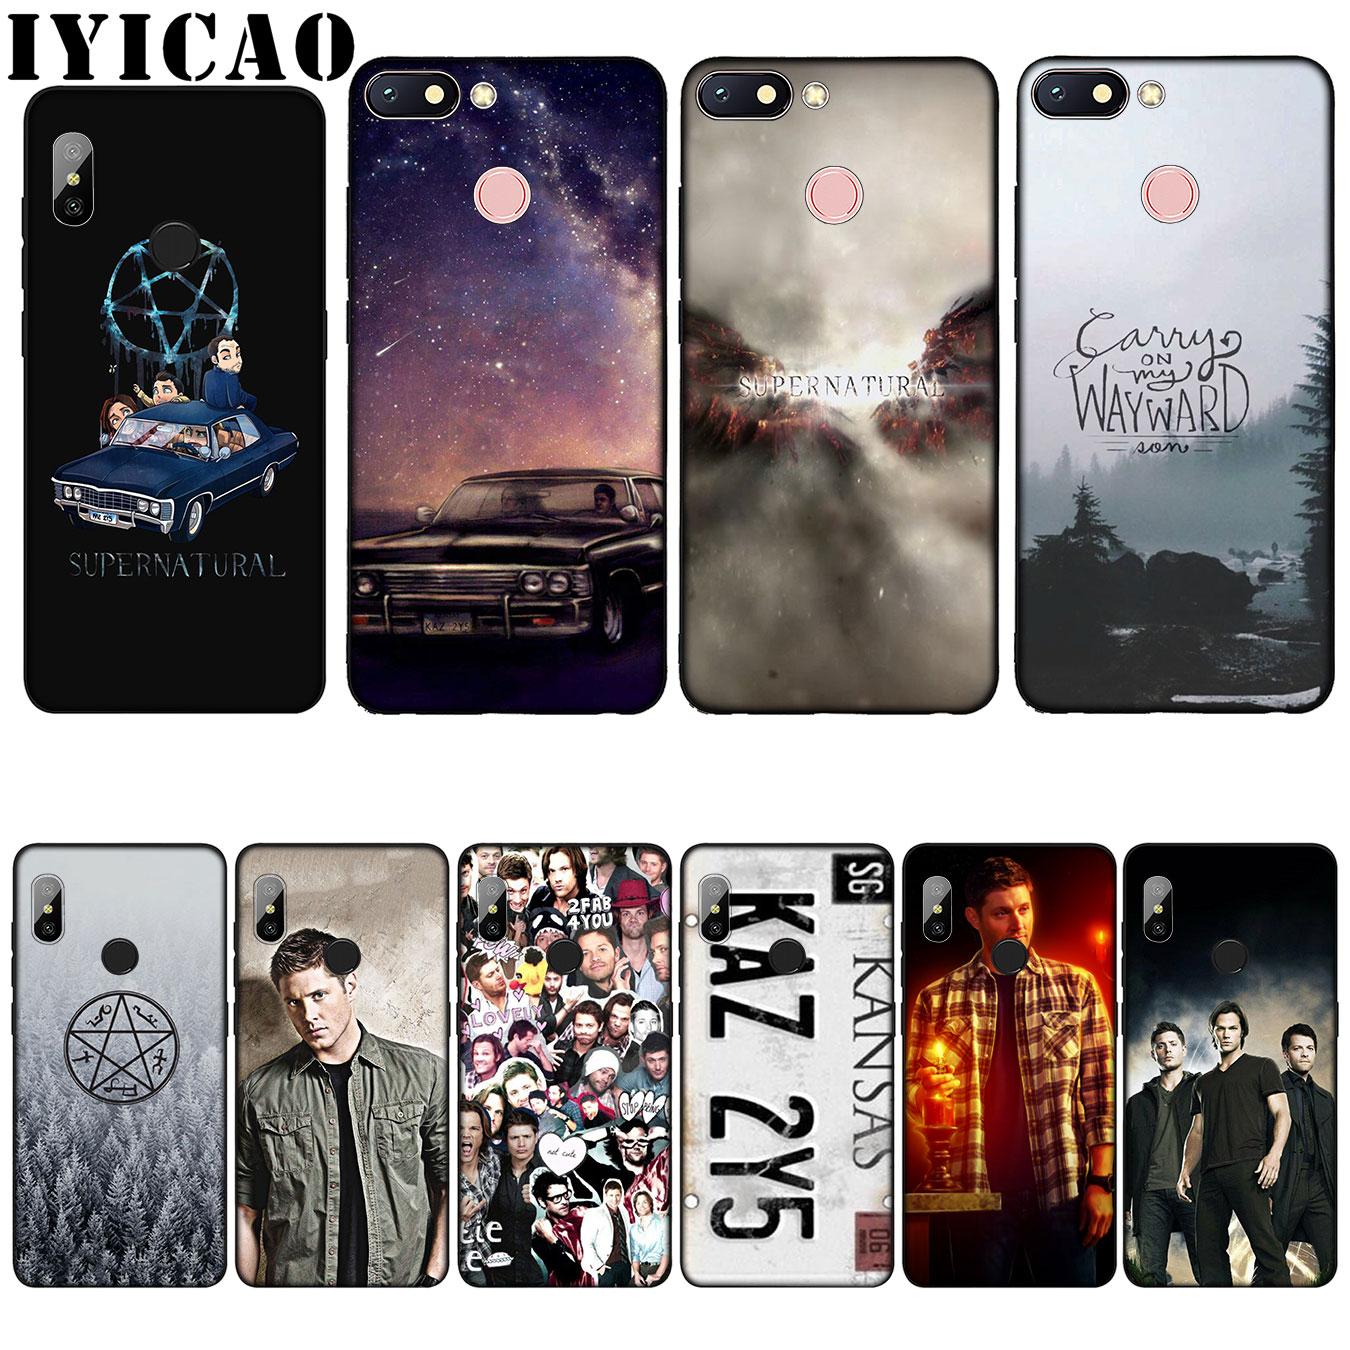 Funda blanda de silicona IYICAO Supernatural Jared Padalecki para Xiaomi Redmi 6A 5A Note 8 7 4 4X 5 Plus 6 Pro negro TPU